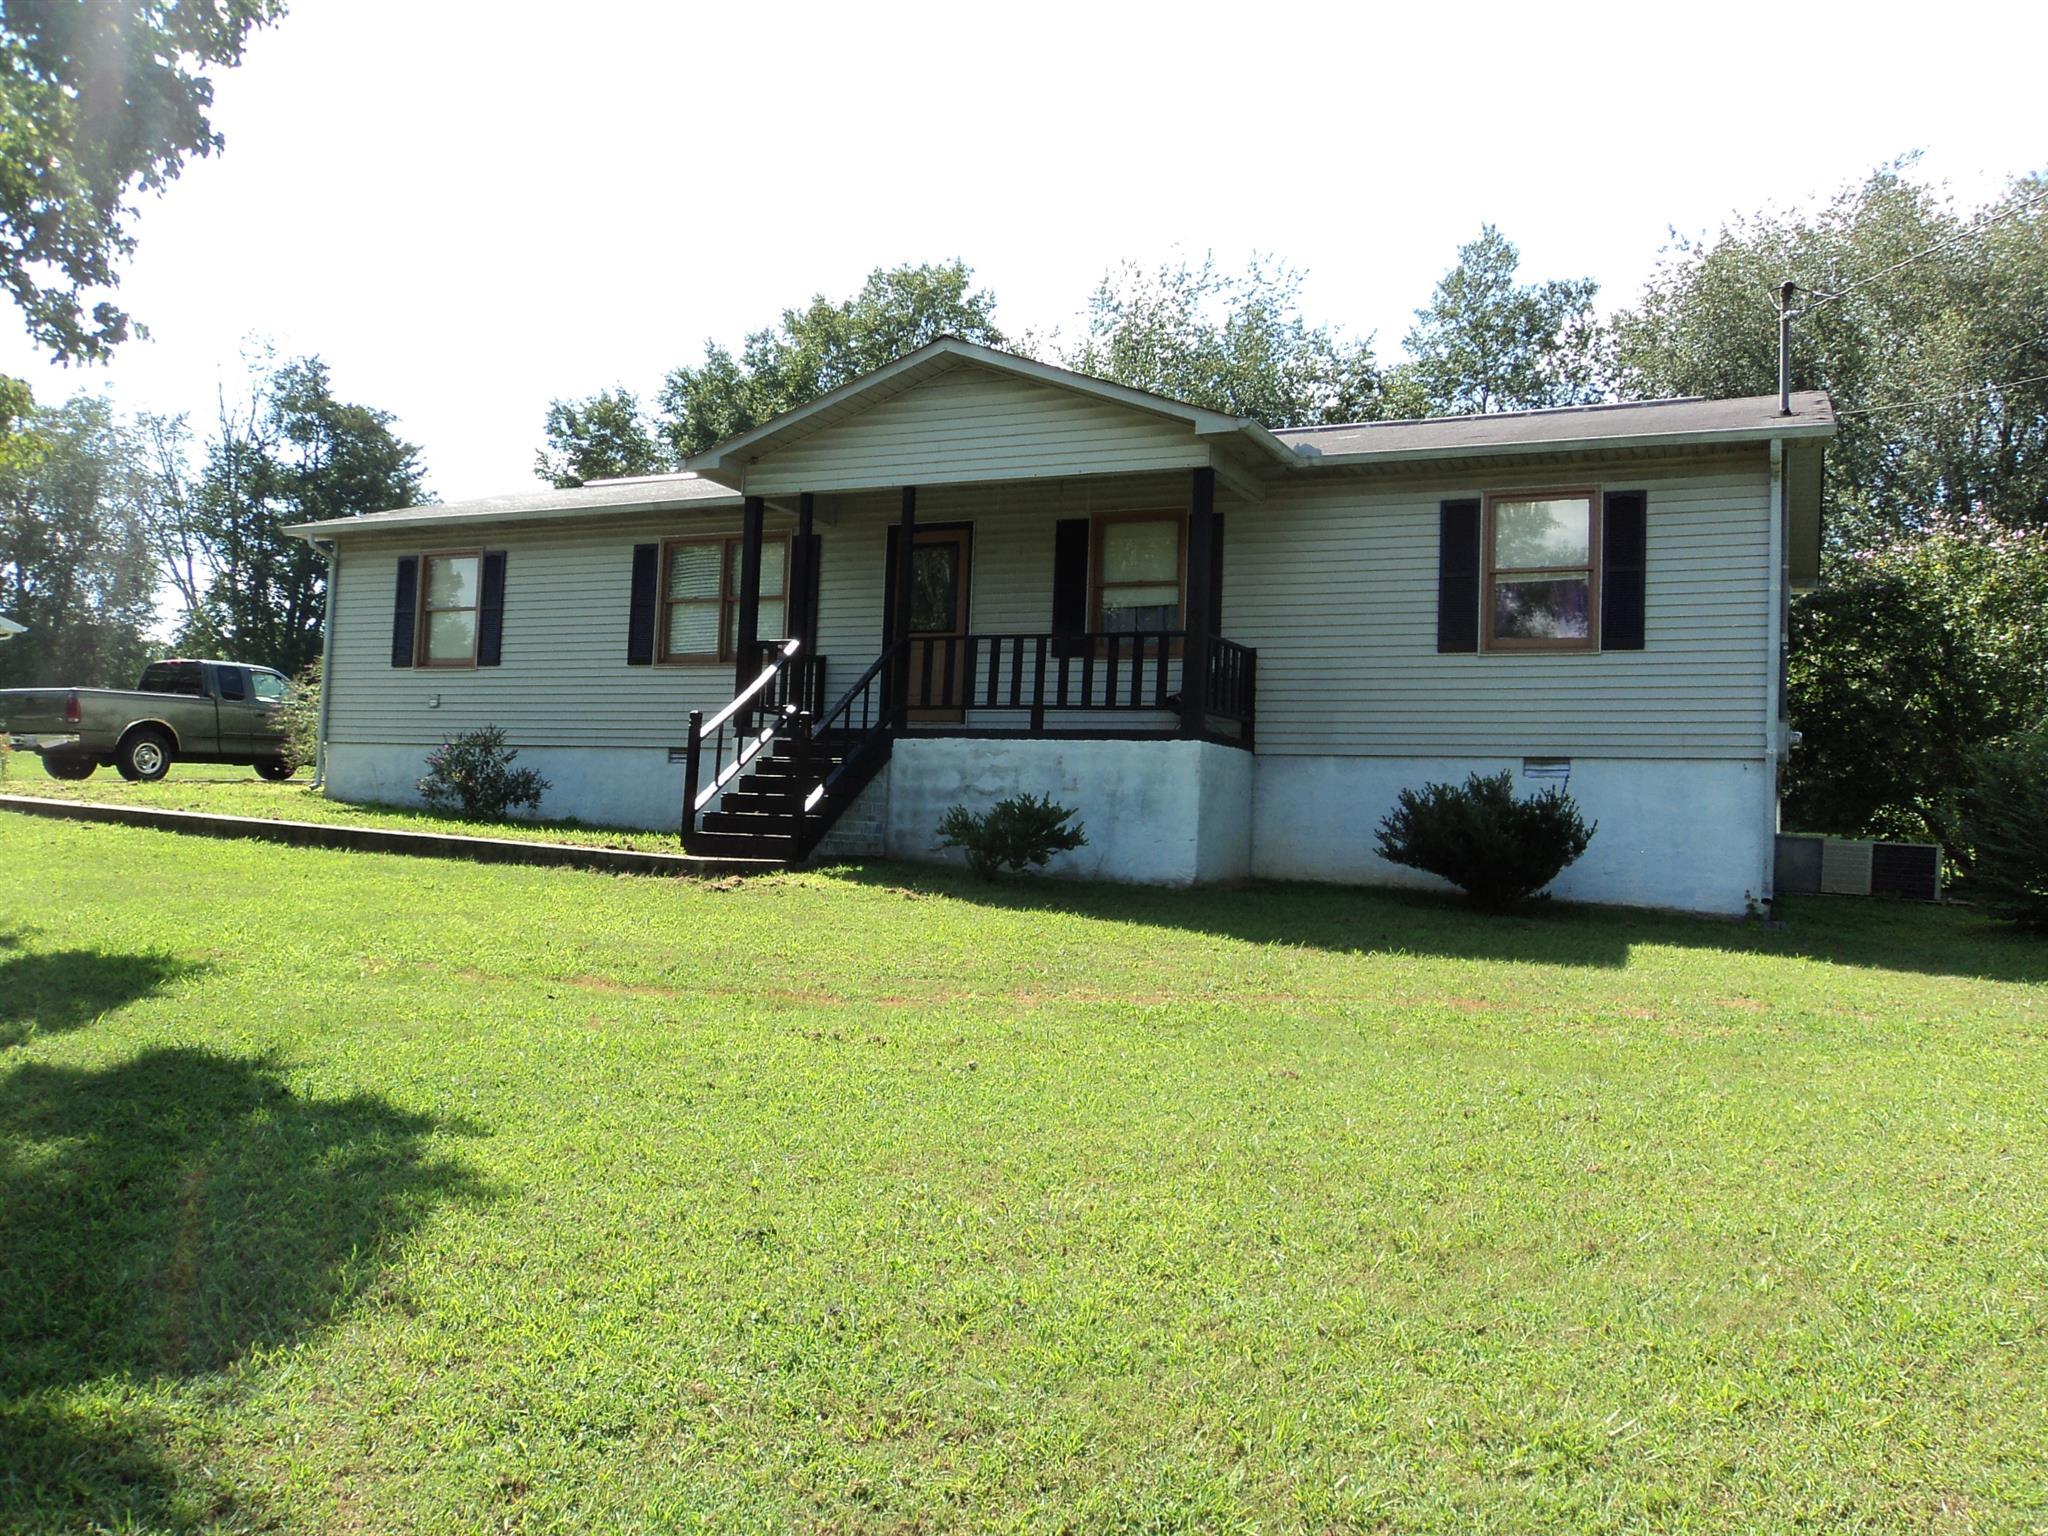 Photo of 234 Lakeside Dr  Estill Springs  TN